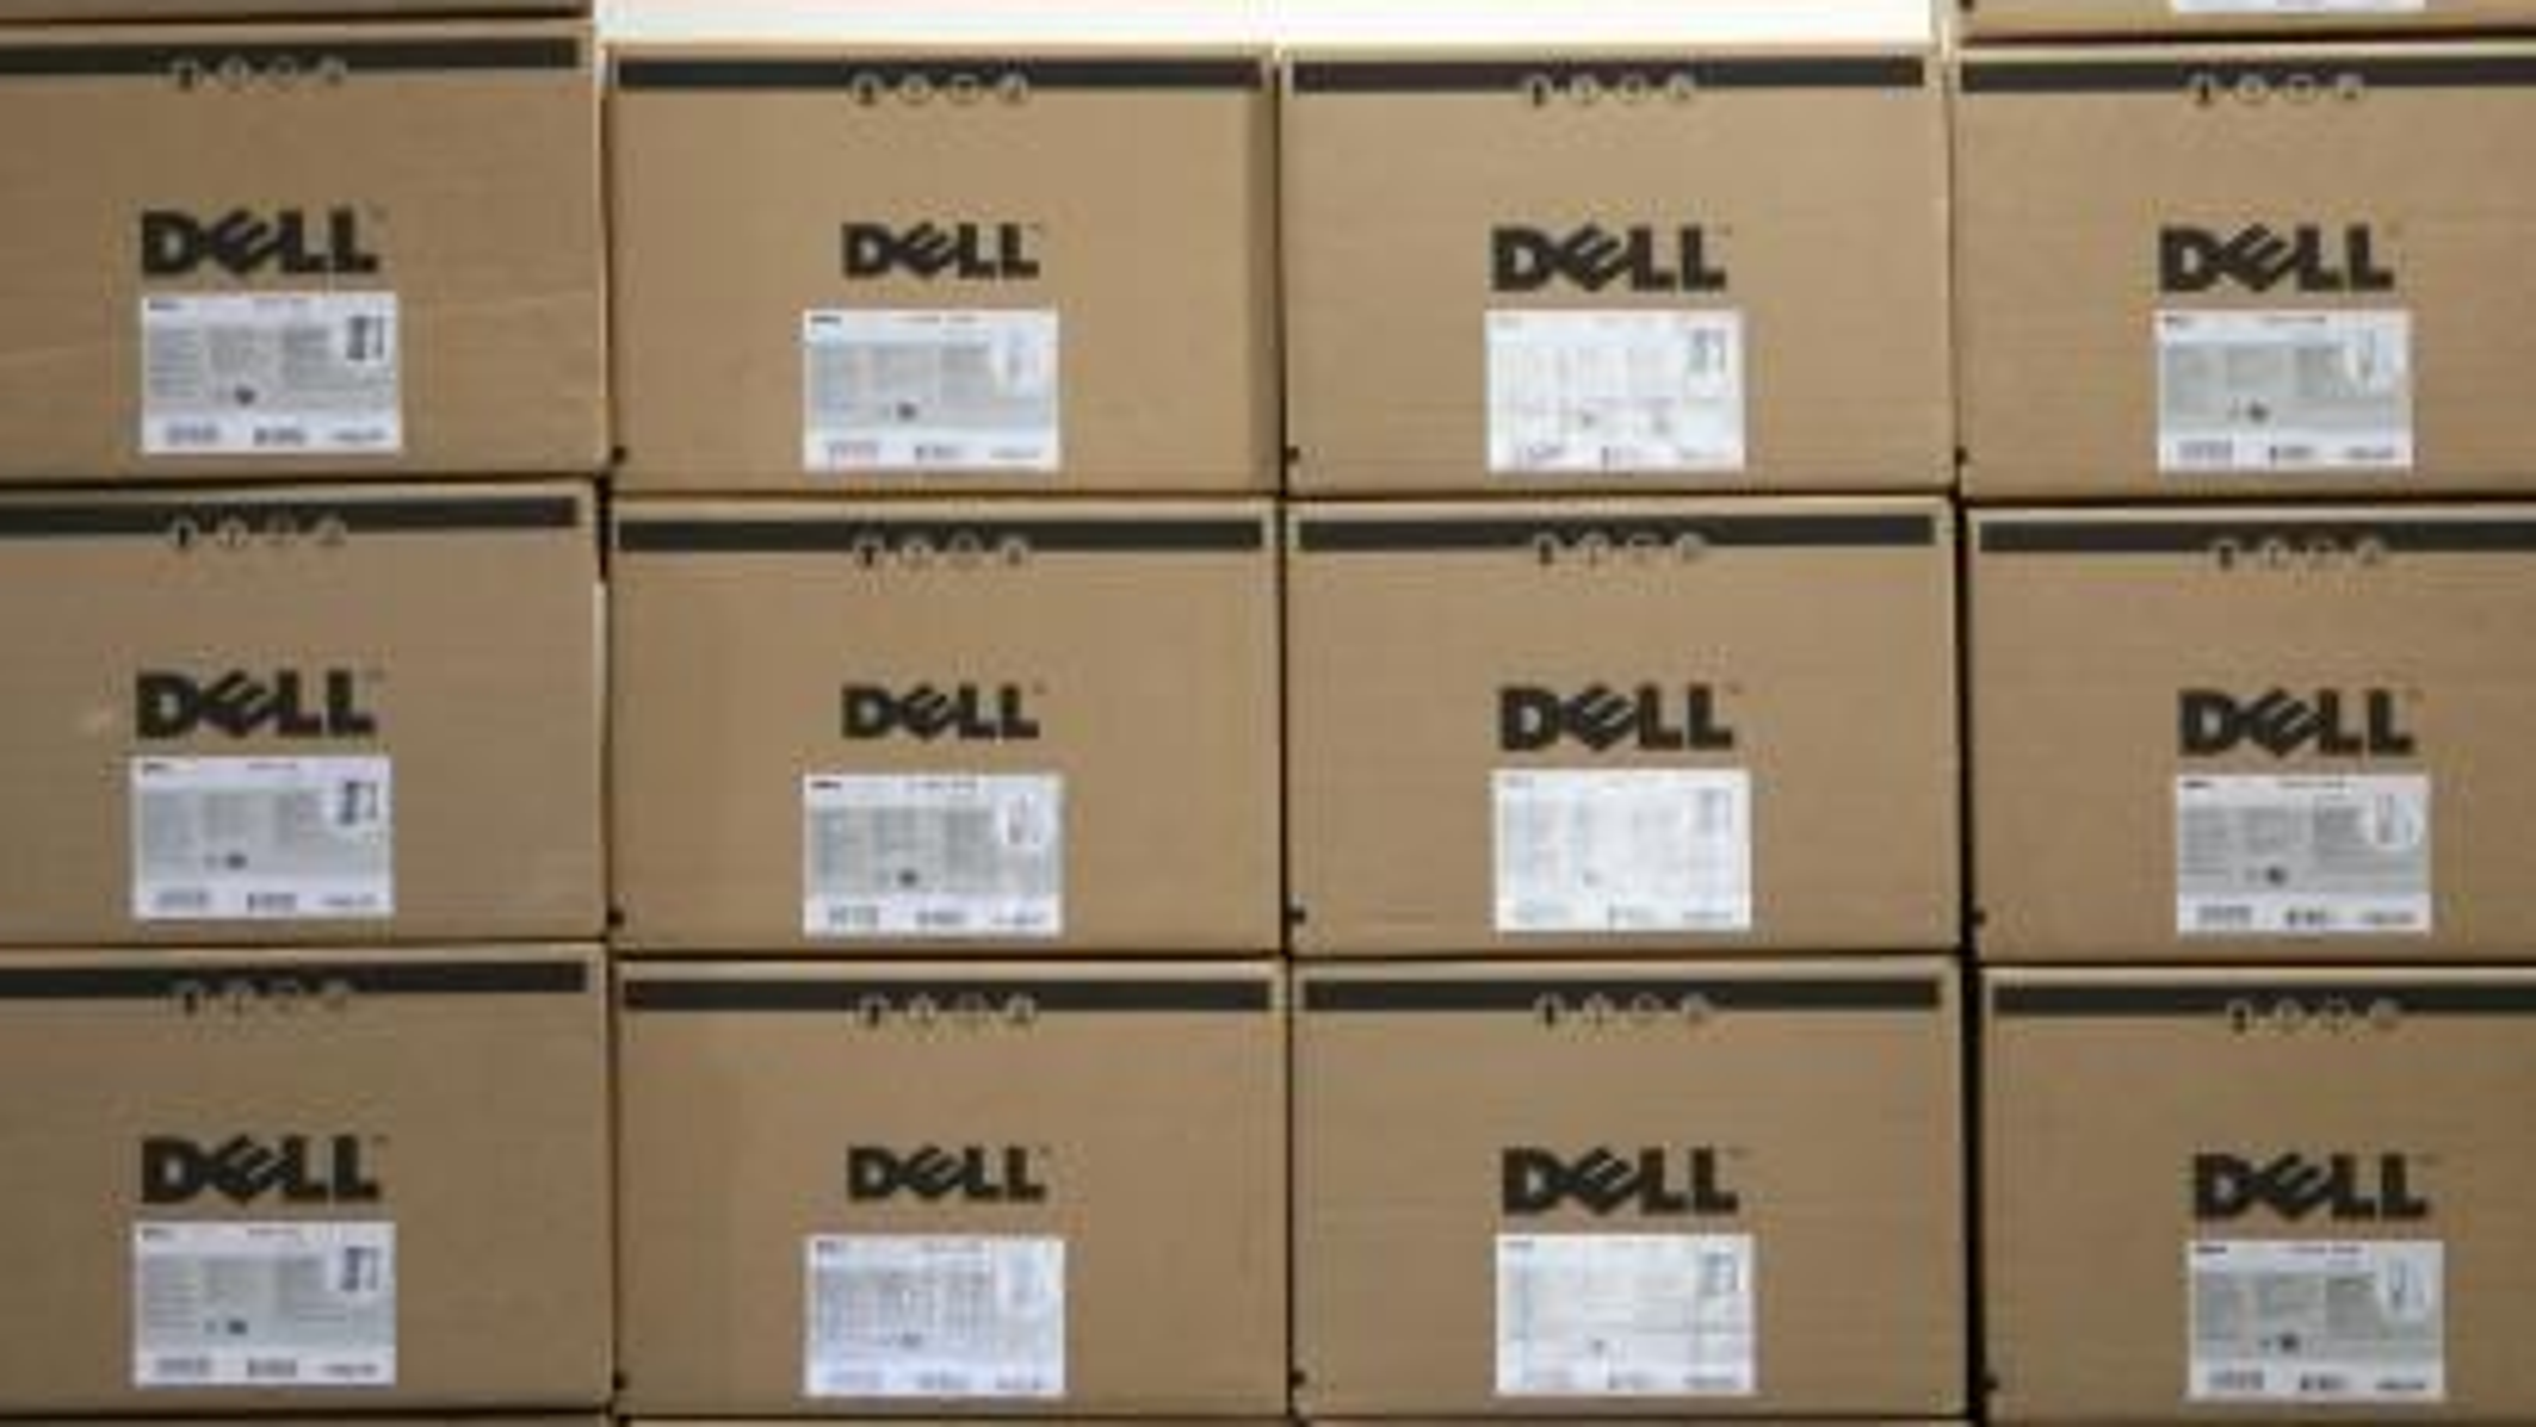 Dell boxes